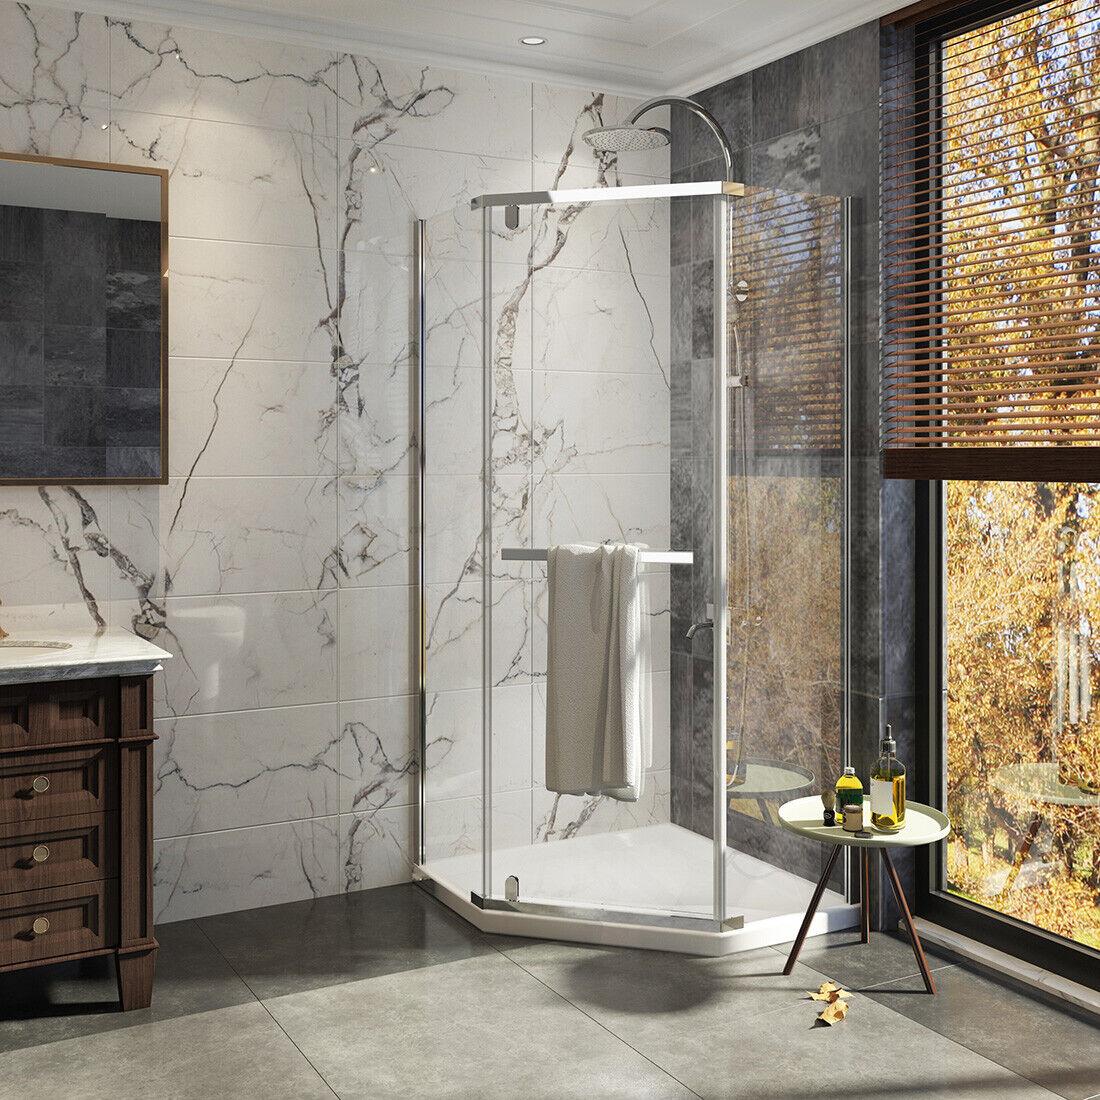 36 X 36 X 72 Neo Angle Pivot Corner Shower Door 1 4 Tempered Clear Glass